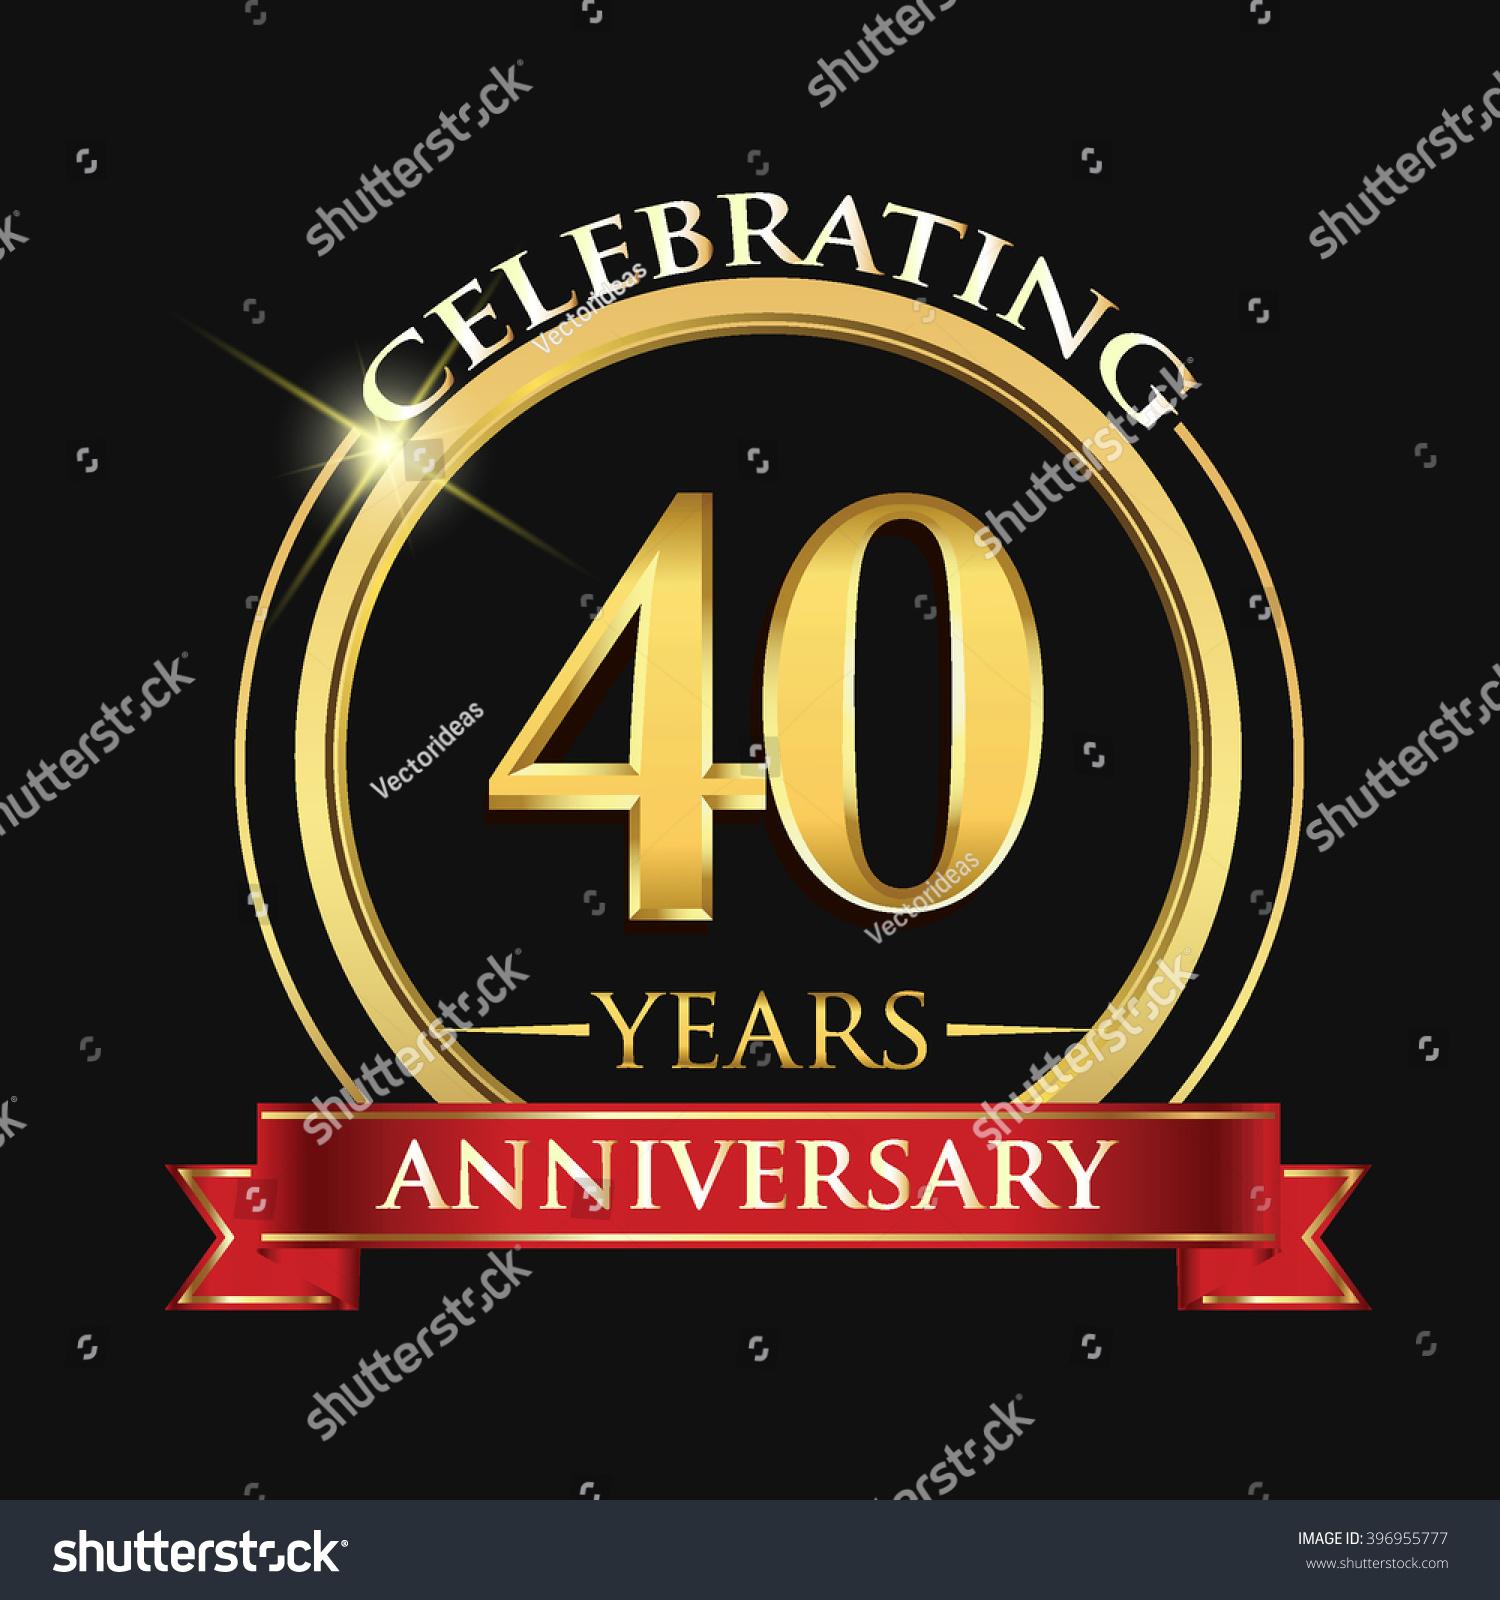 Celebrating 40 Years Anniversary Logo Golden Stock Vector